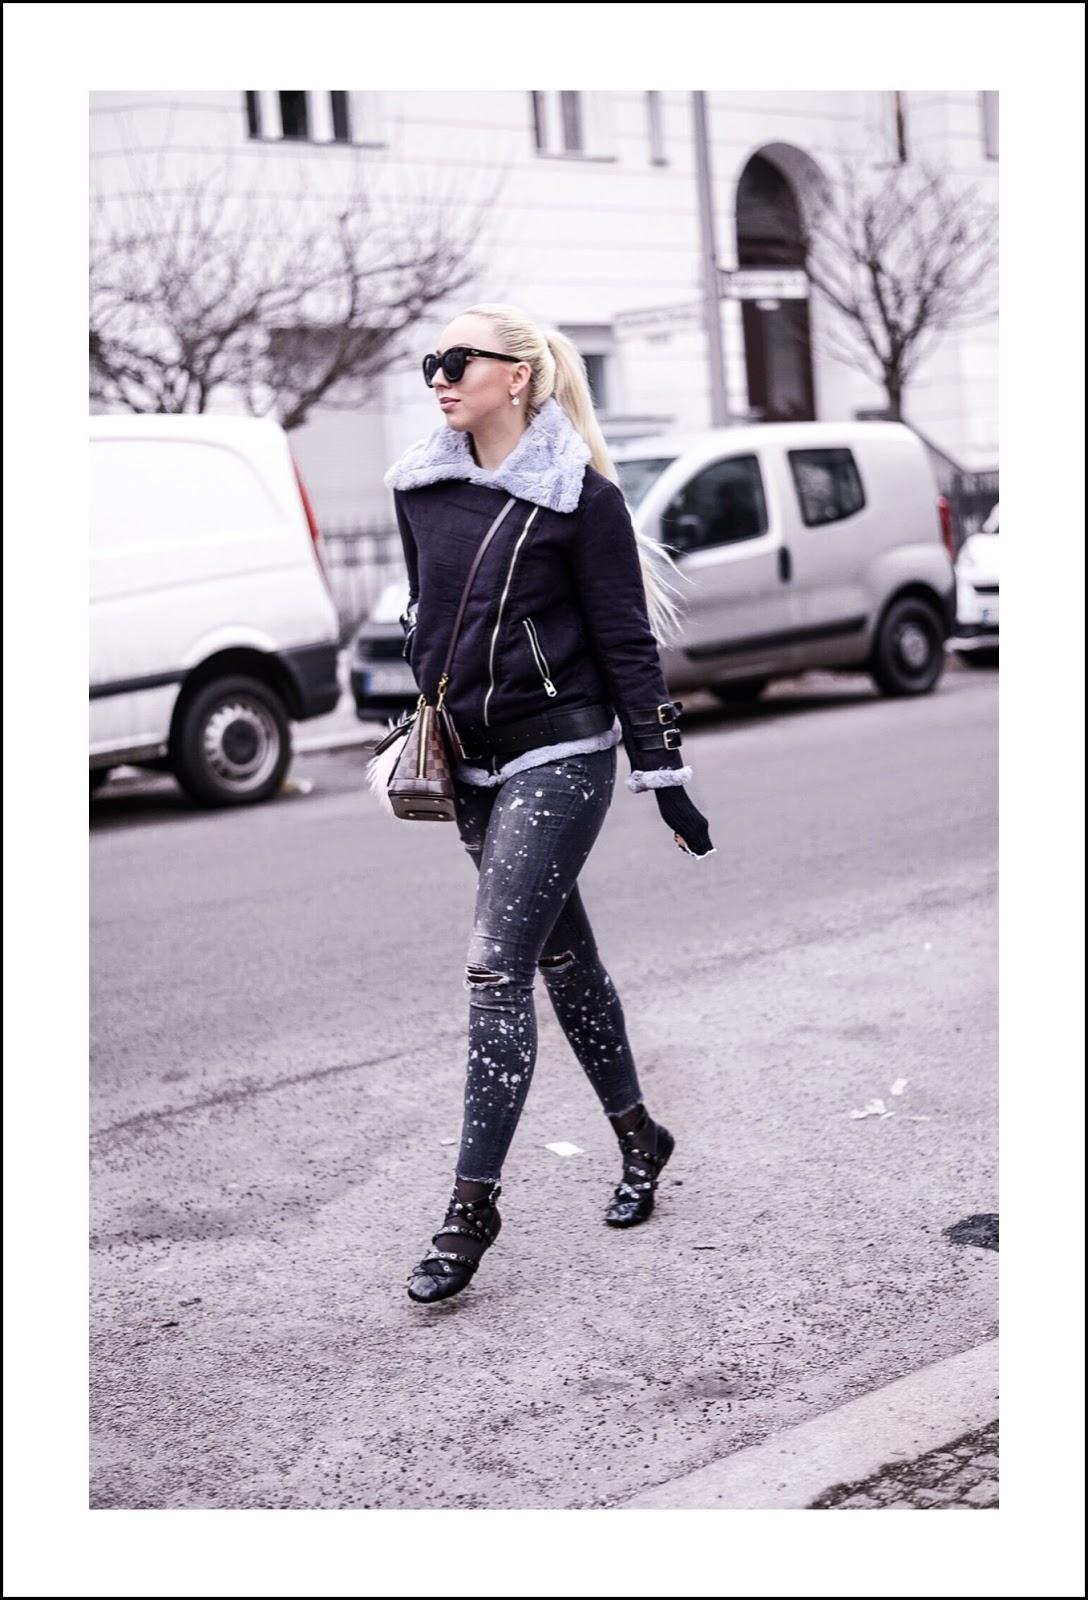 winter streetstyle_shearling jackets_miu miu inspired flats